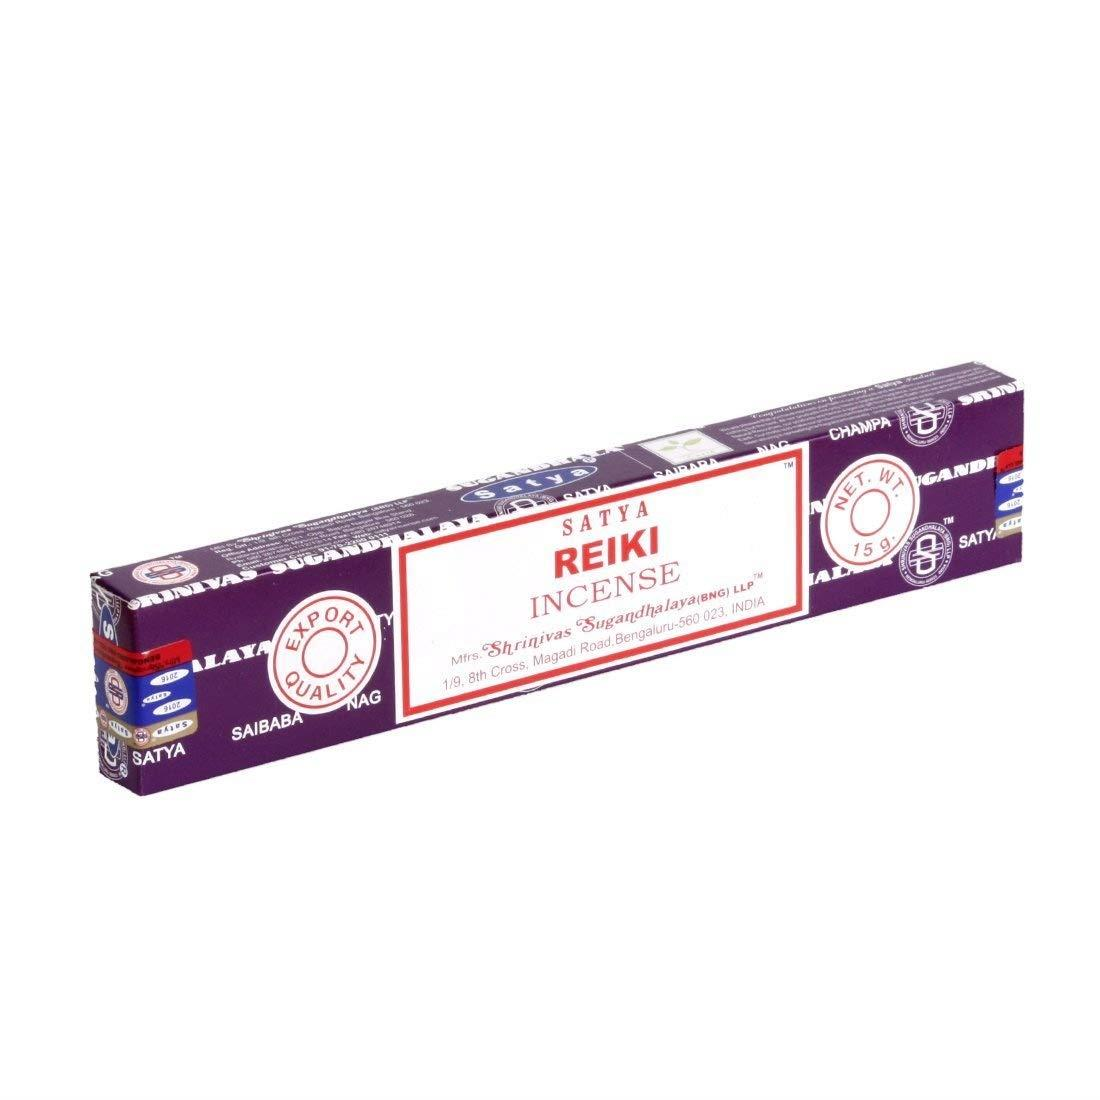 Satya Genuine 15g Incense Sticks - Reiki 8904245400026 | eBay